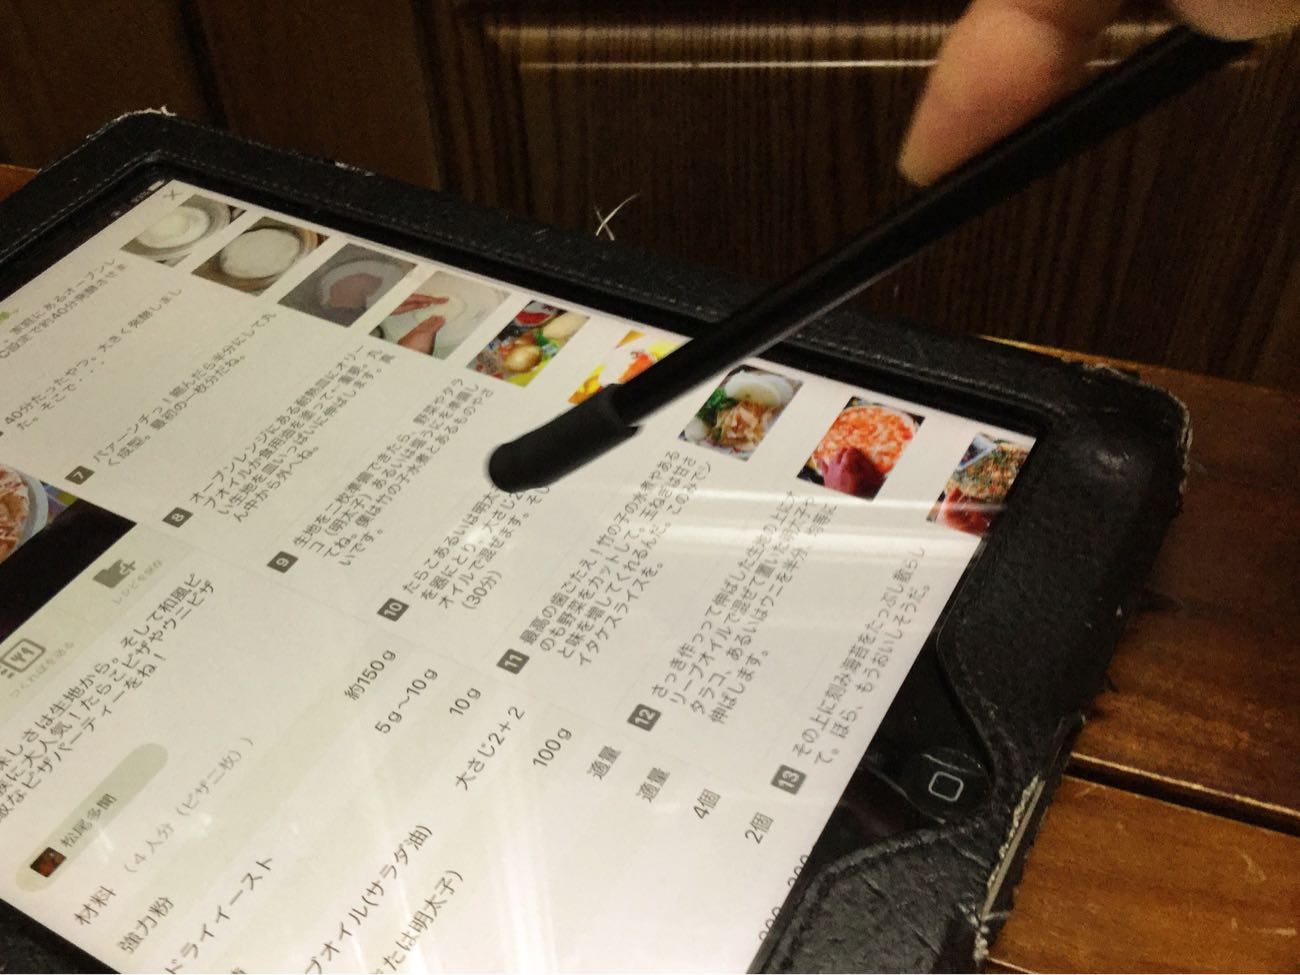 iPadでクックパッドを見ながら料理